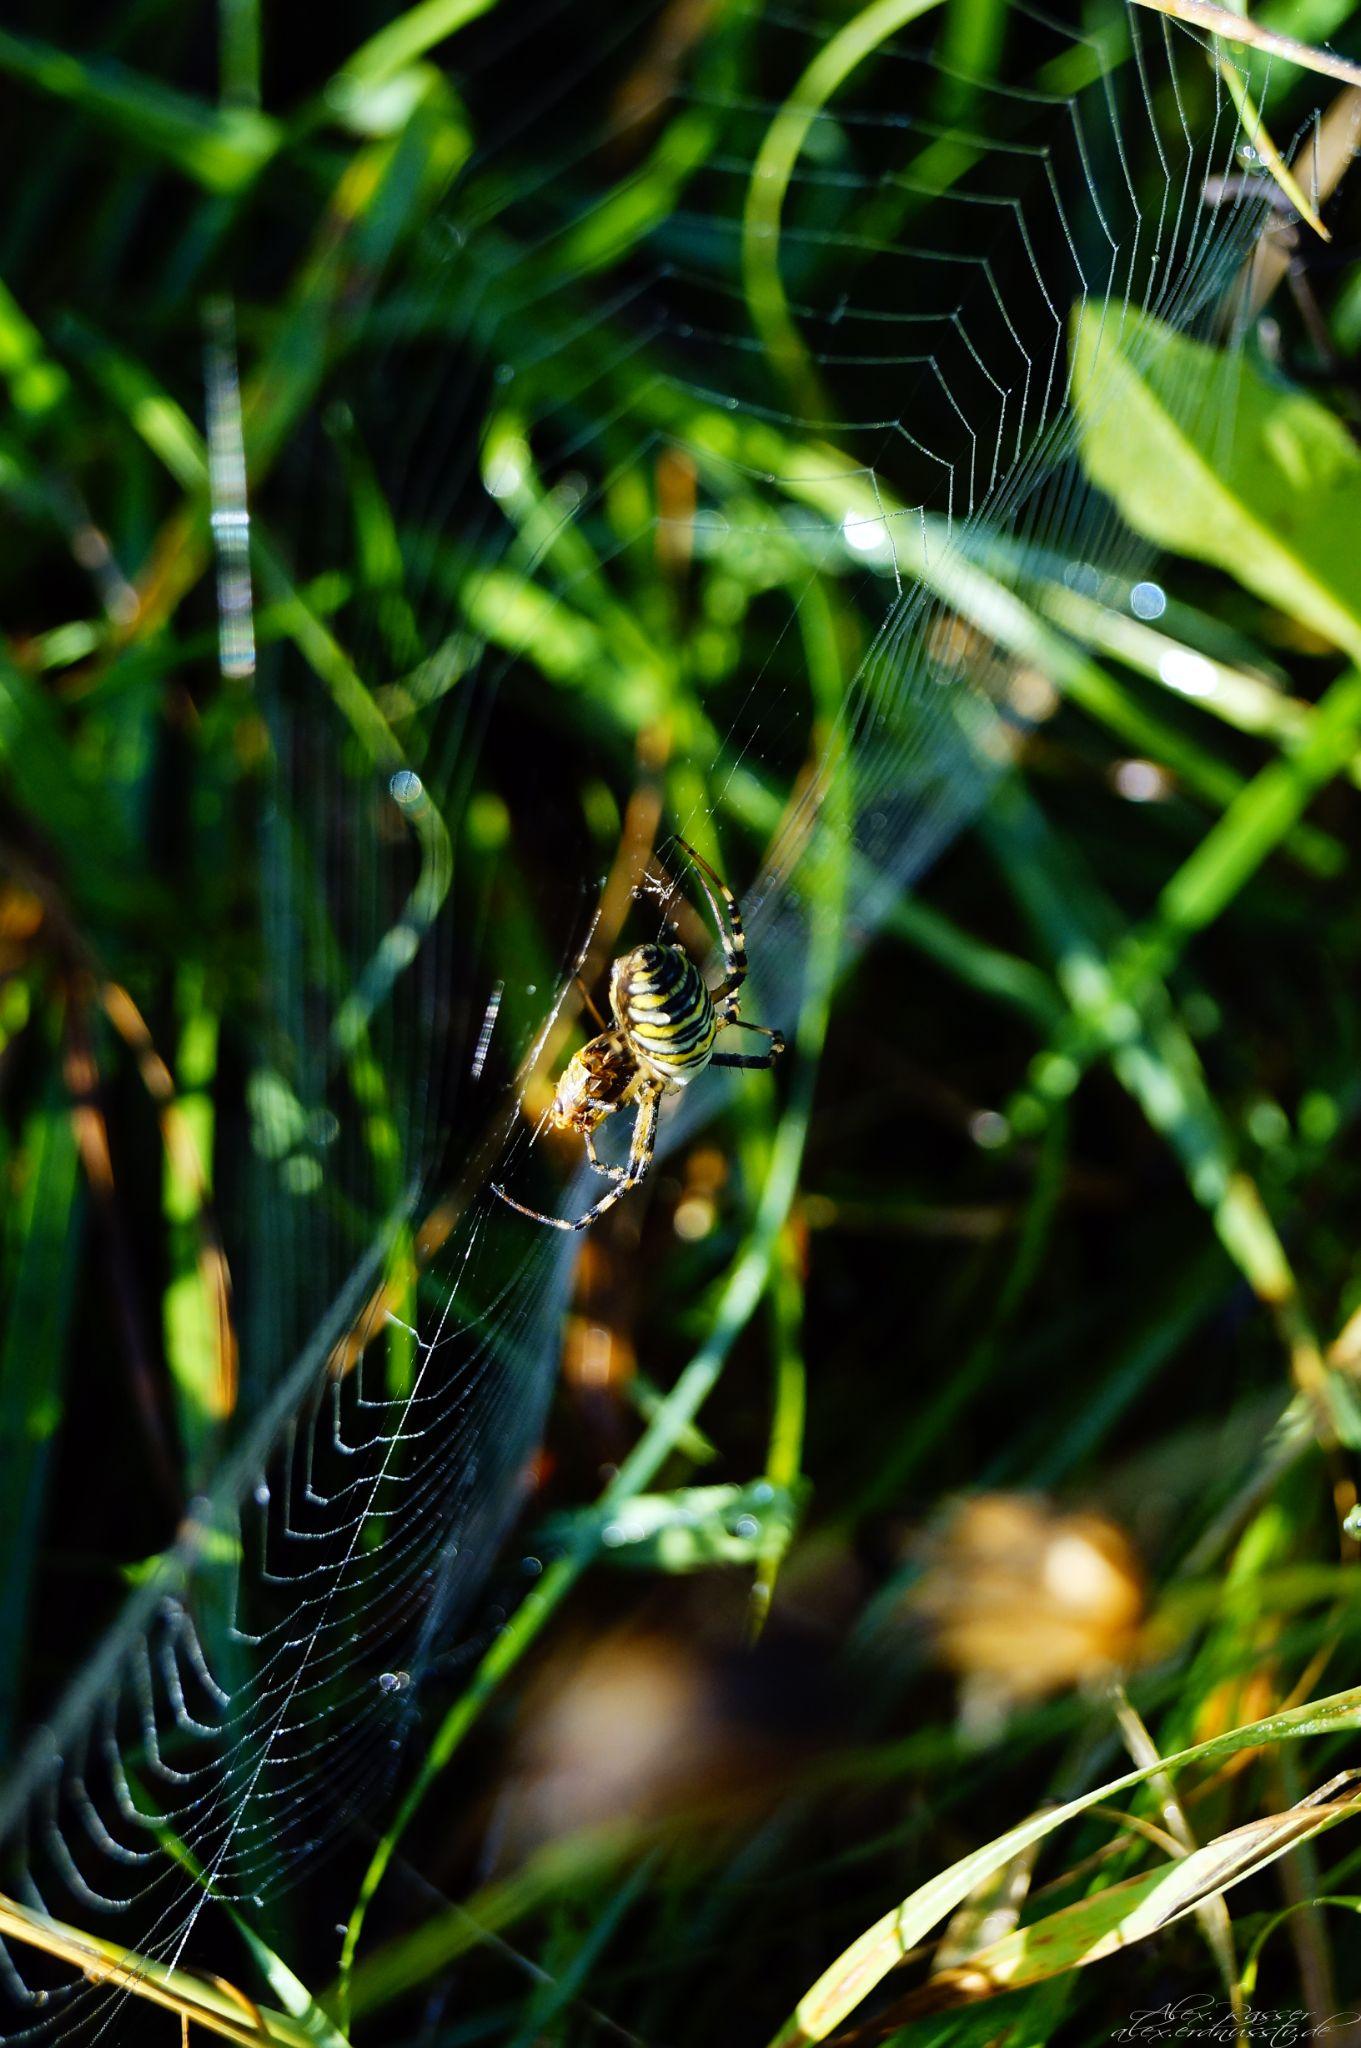 Wespenspinne by alexrasser